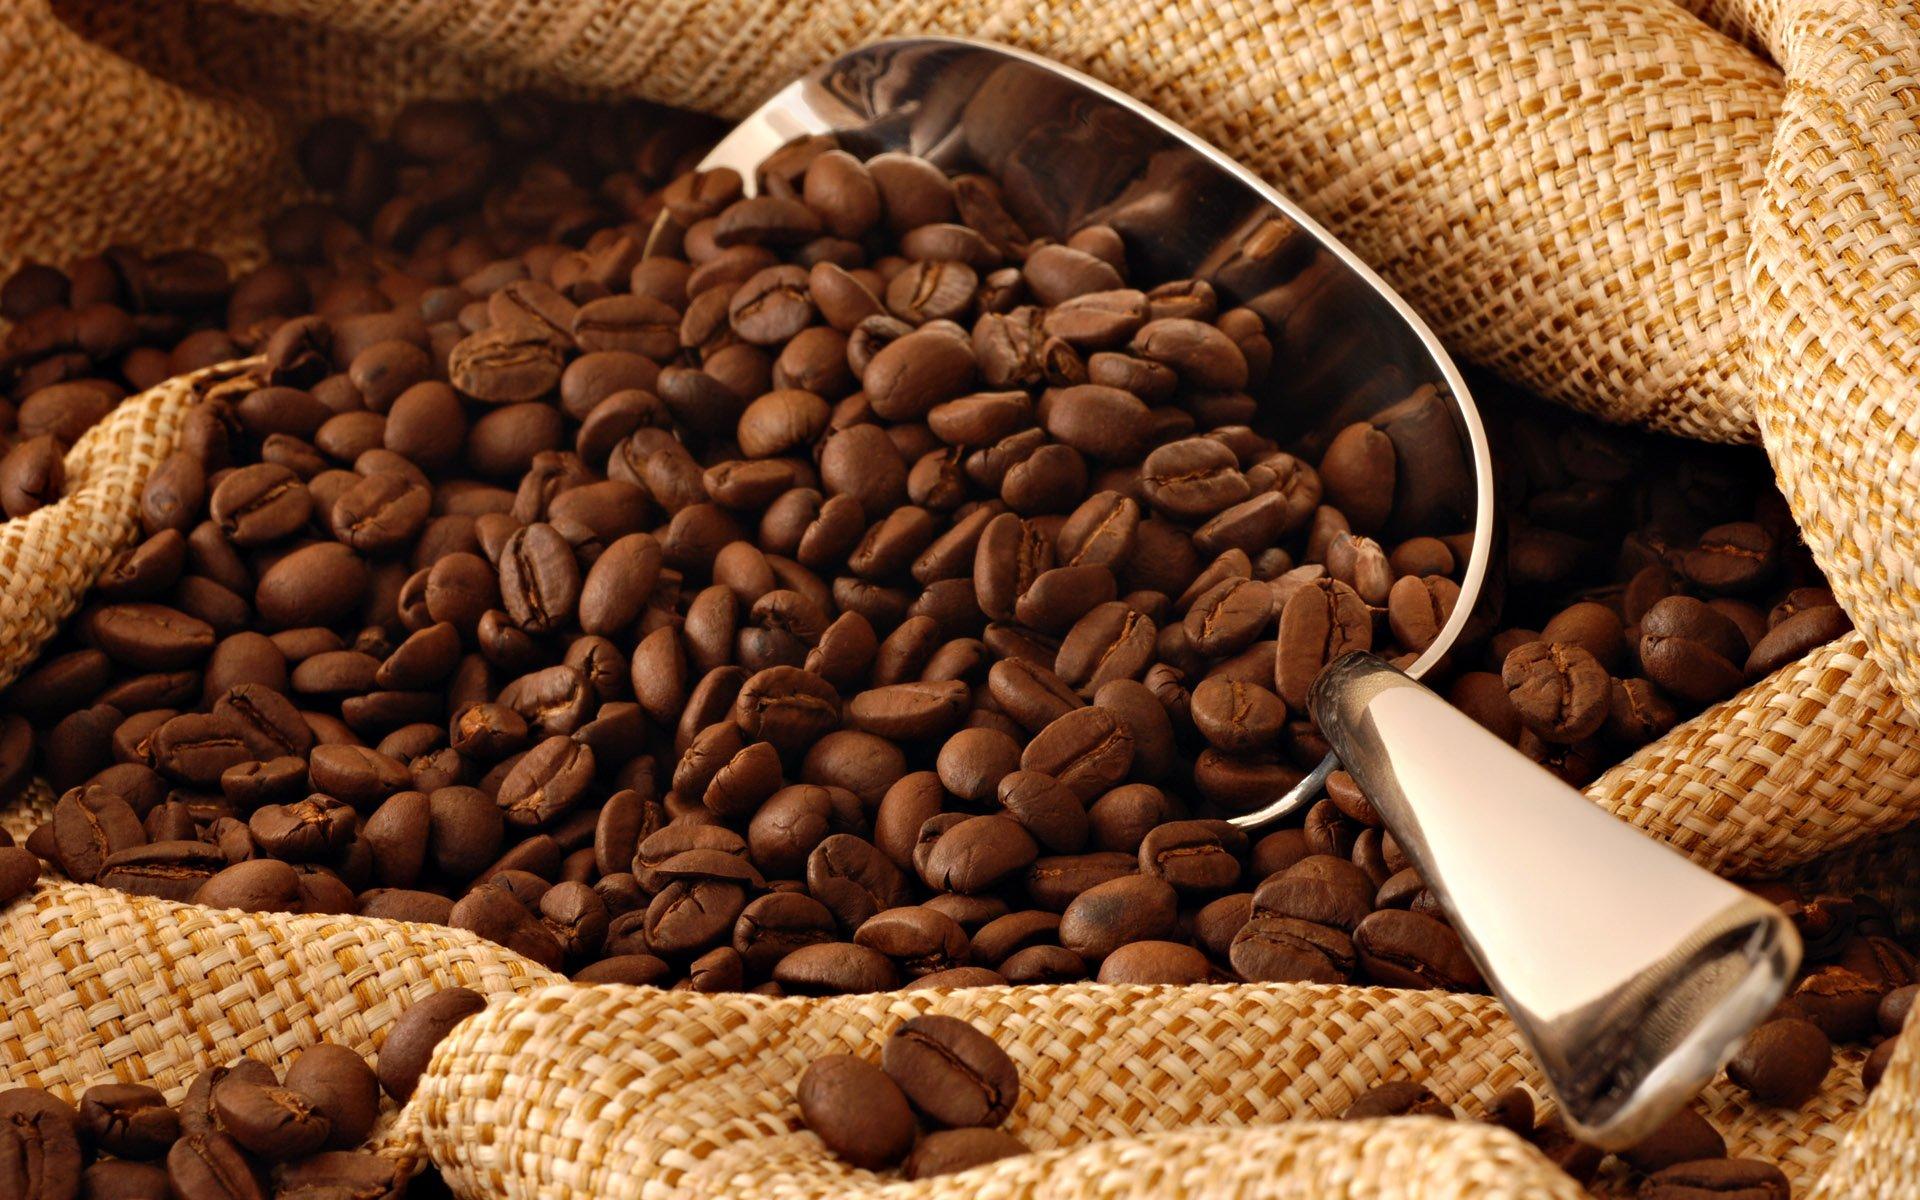 Peru Approcassi Cajamarca Fair Trade Shade Grown Organic Coffee Beans (Medium Roast (Full City +), 15 Pounds Whole Beans) by RhoadsRoast Coffees (Image #4)